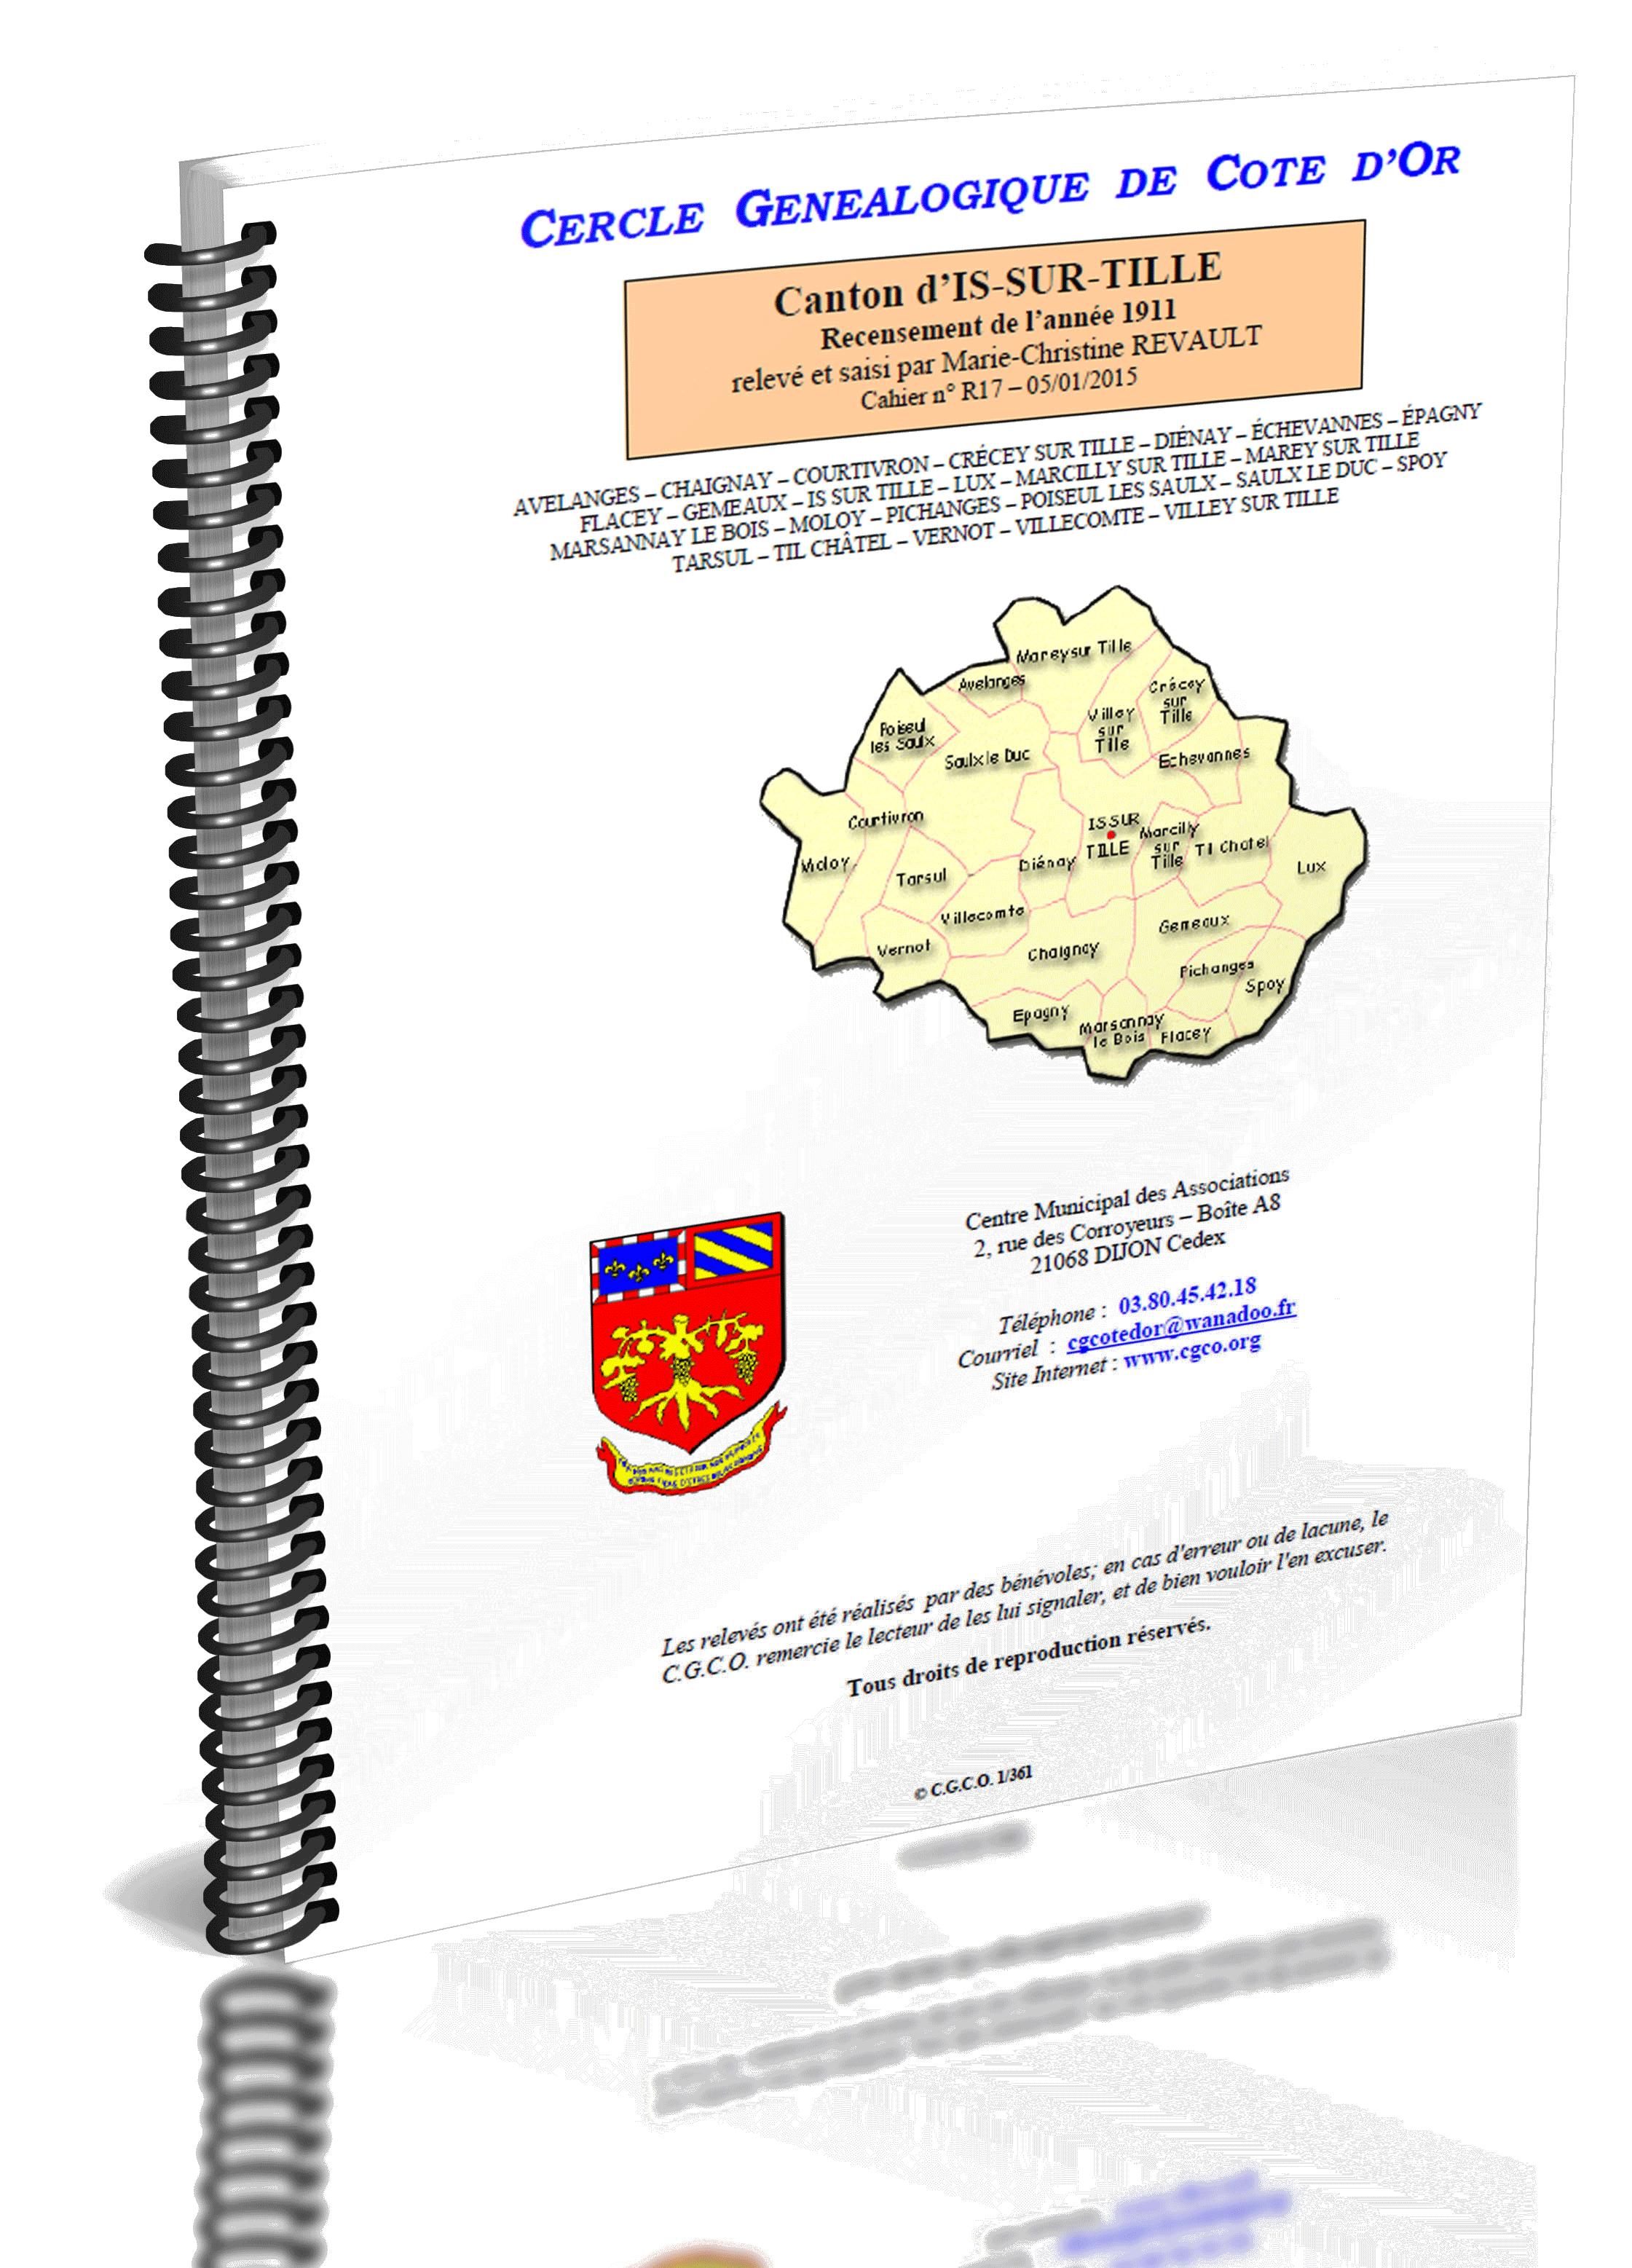 cahier-recensement-is-sur-tille-NBK0072